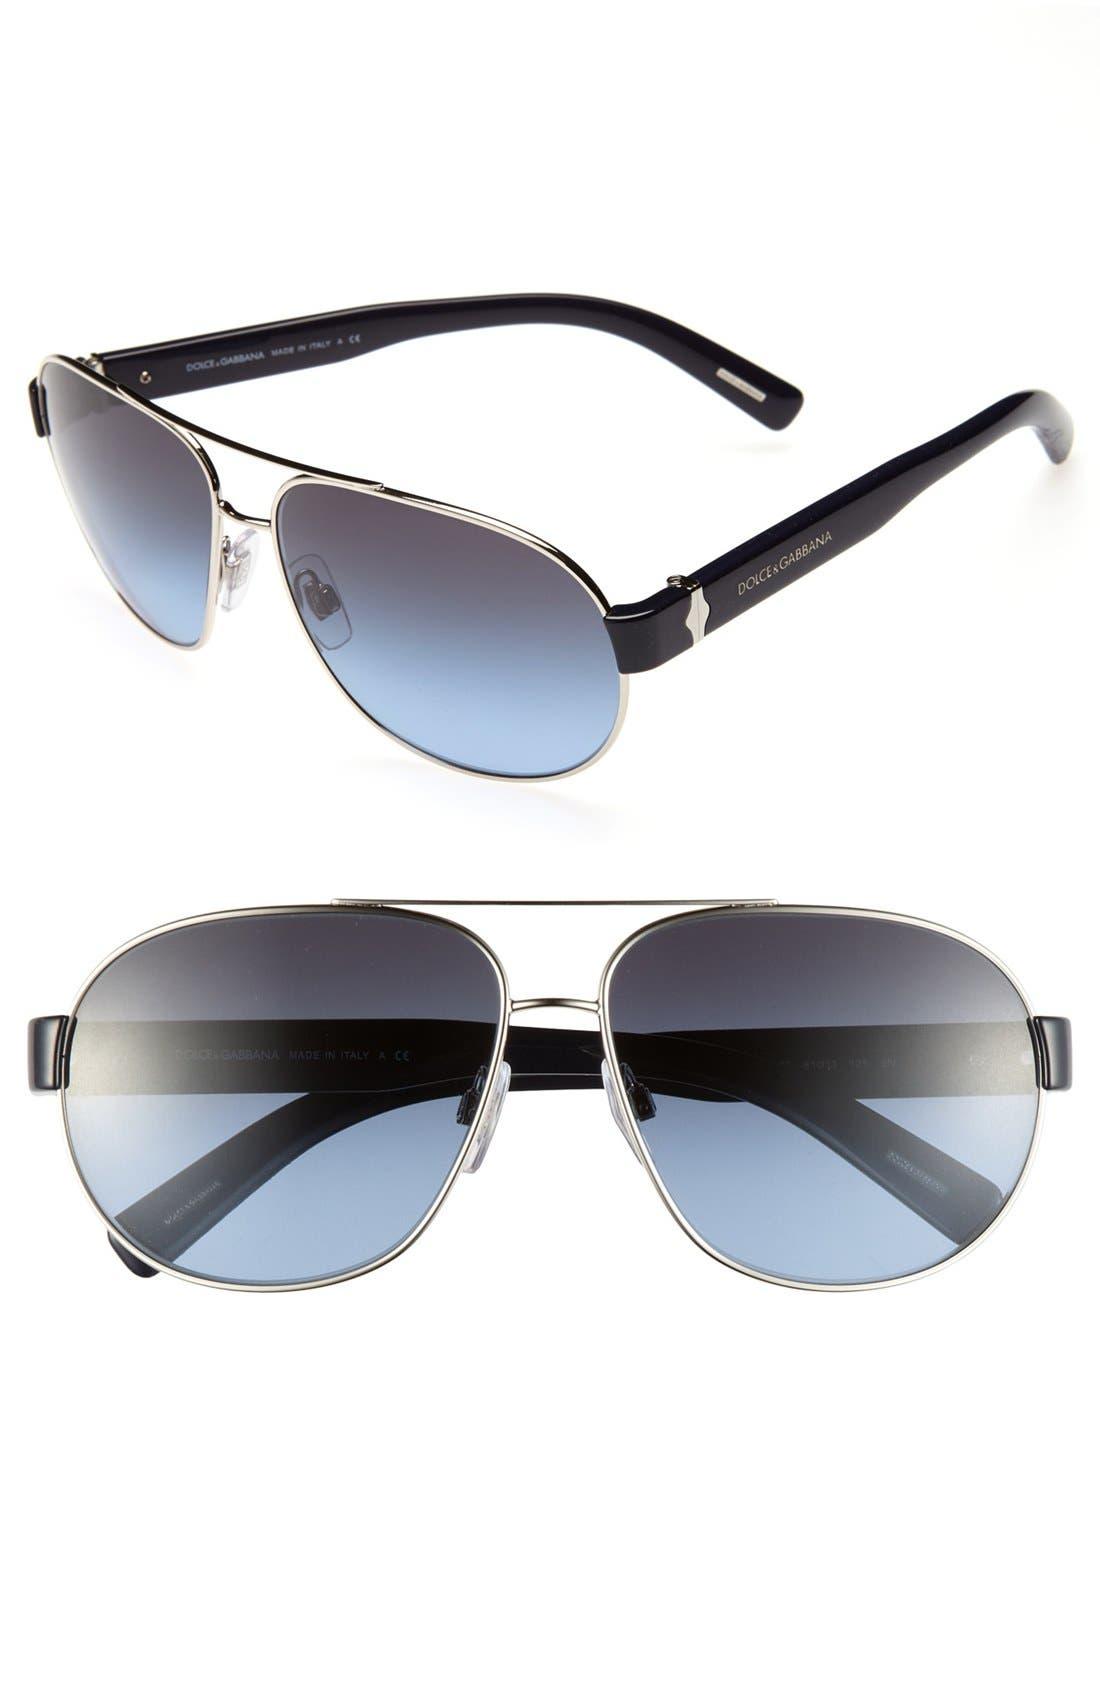 Main Image - Dolce&Gabbana 61mm Aviator Sunglasses